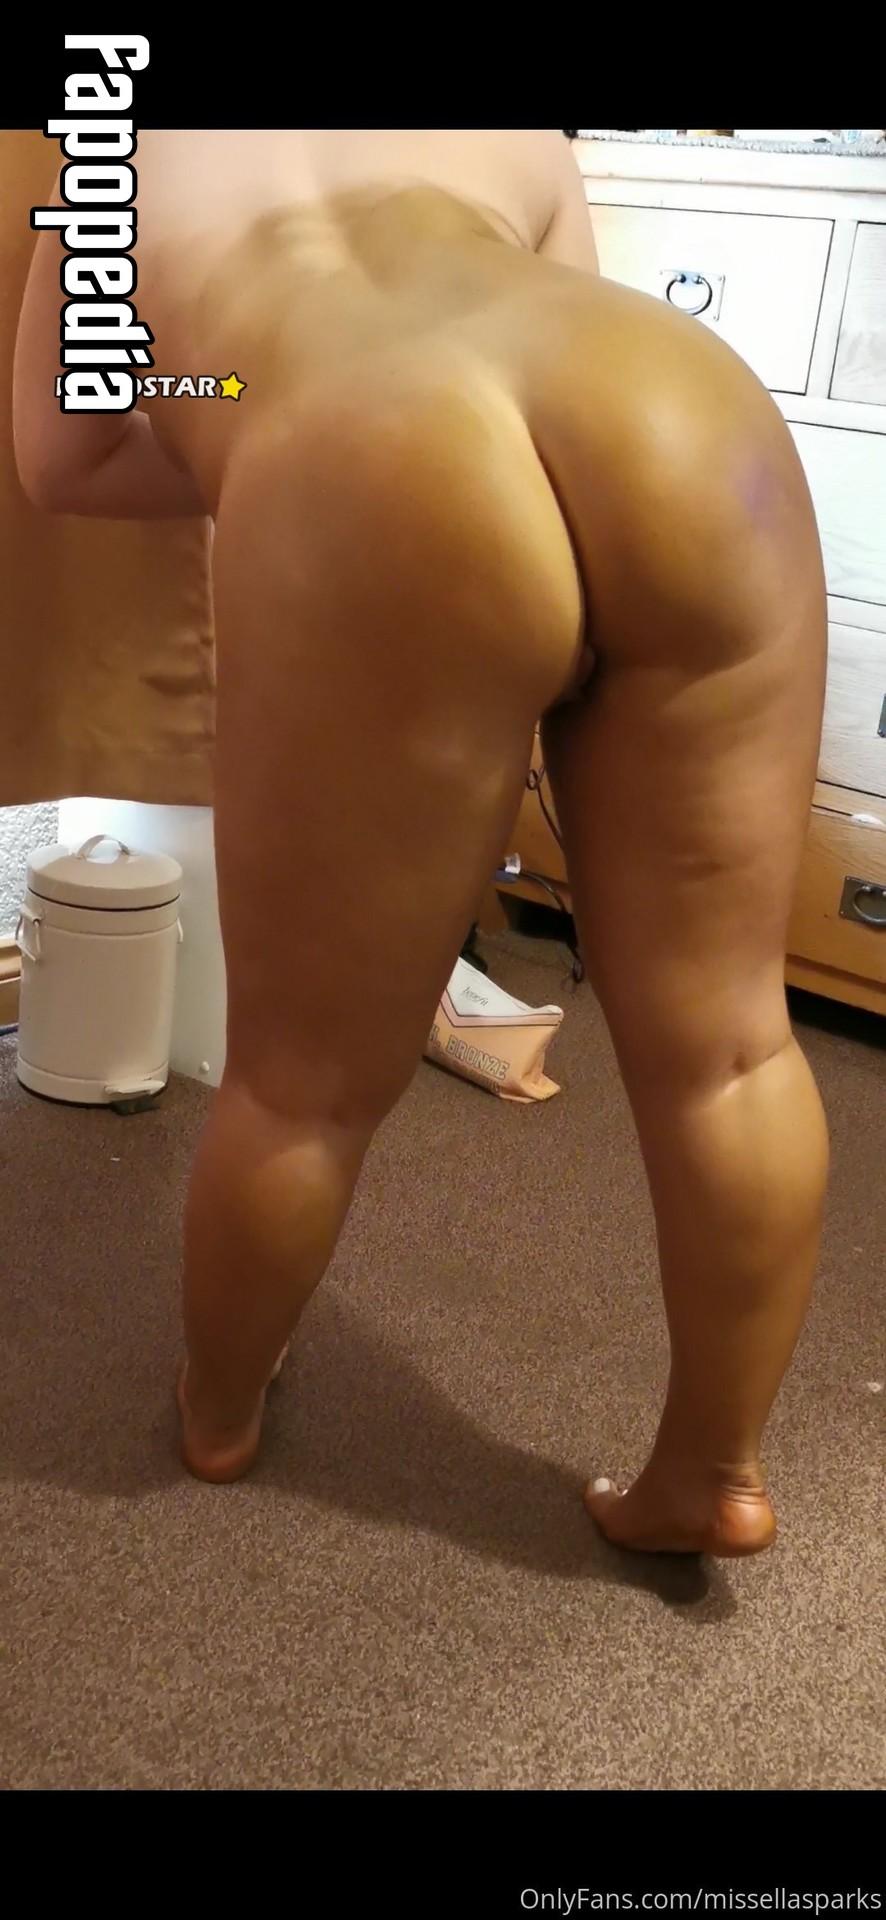 Missellasparks Nude OnlyFans Leaks